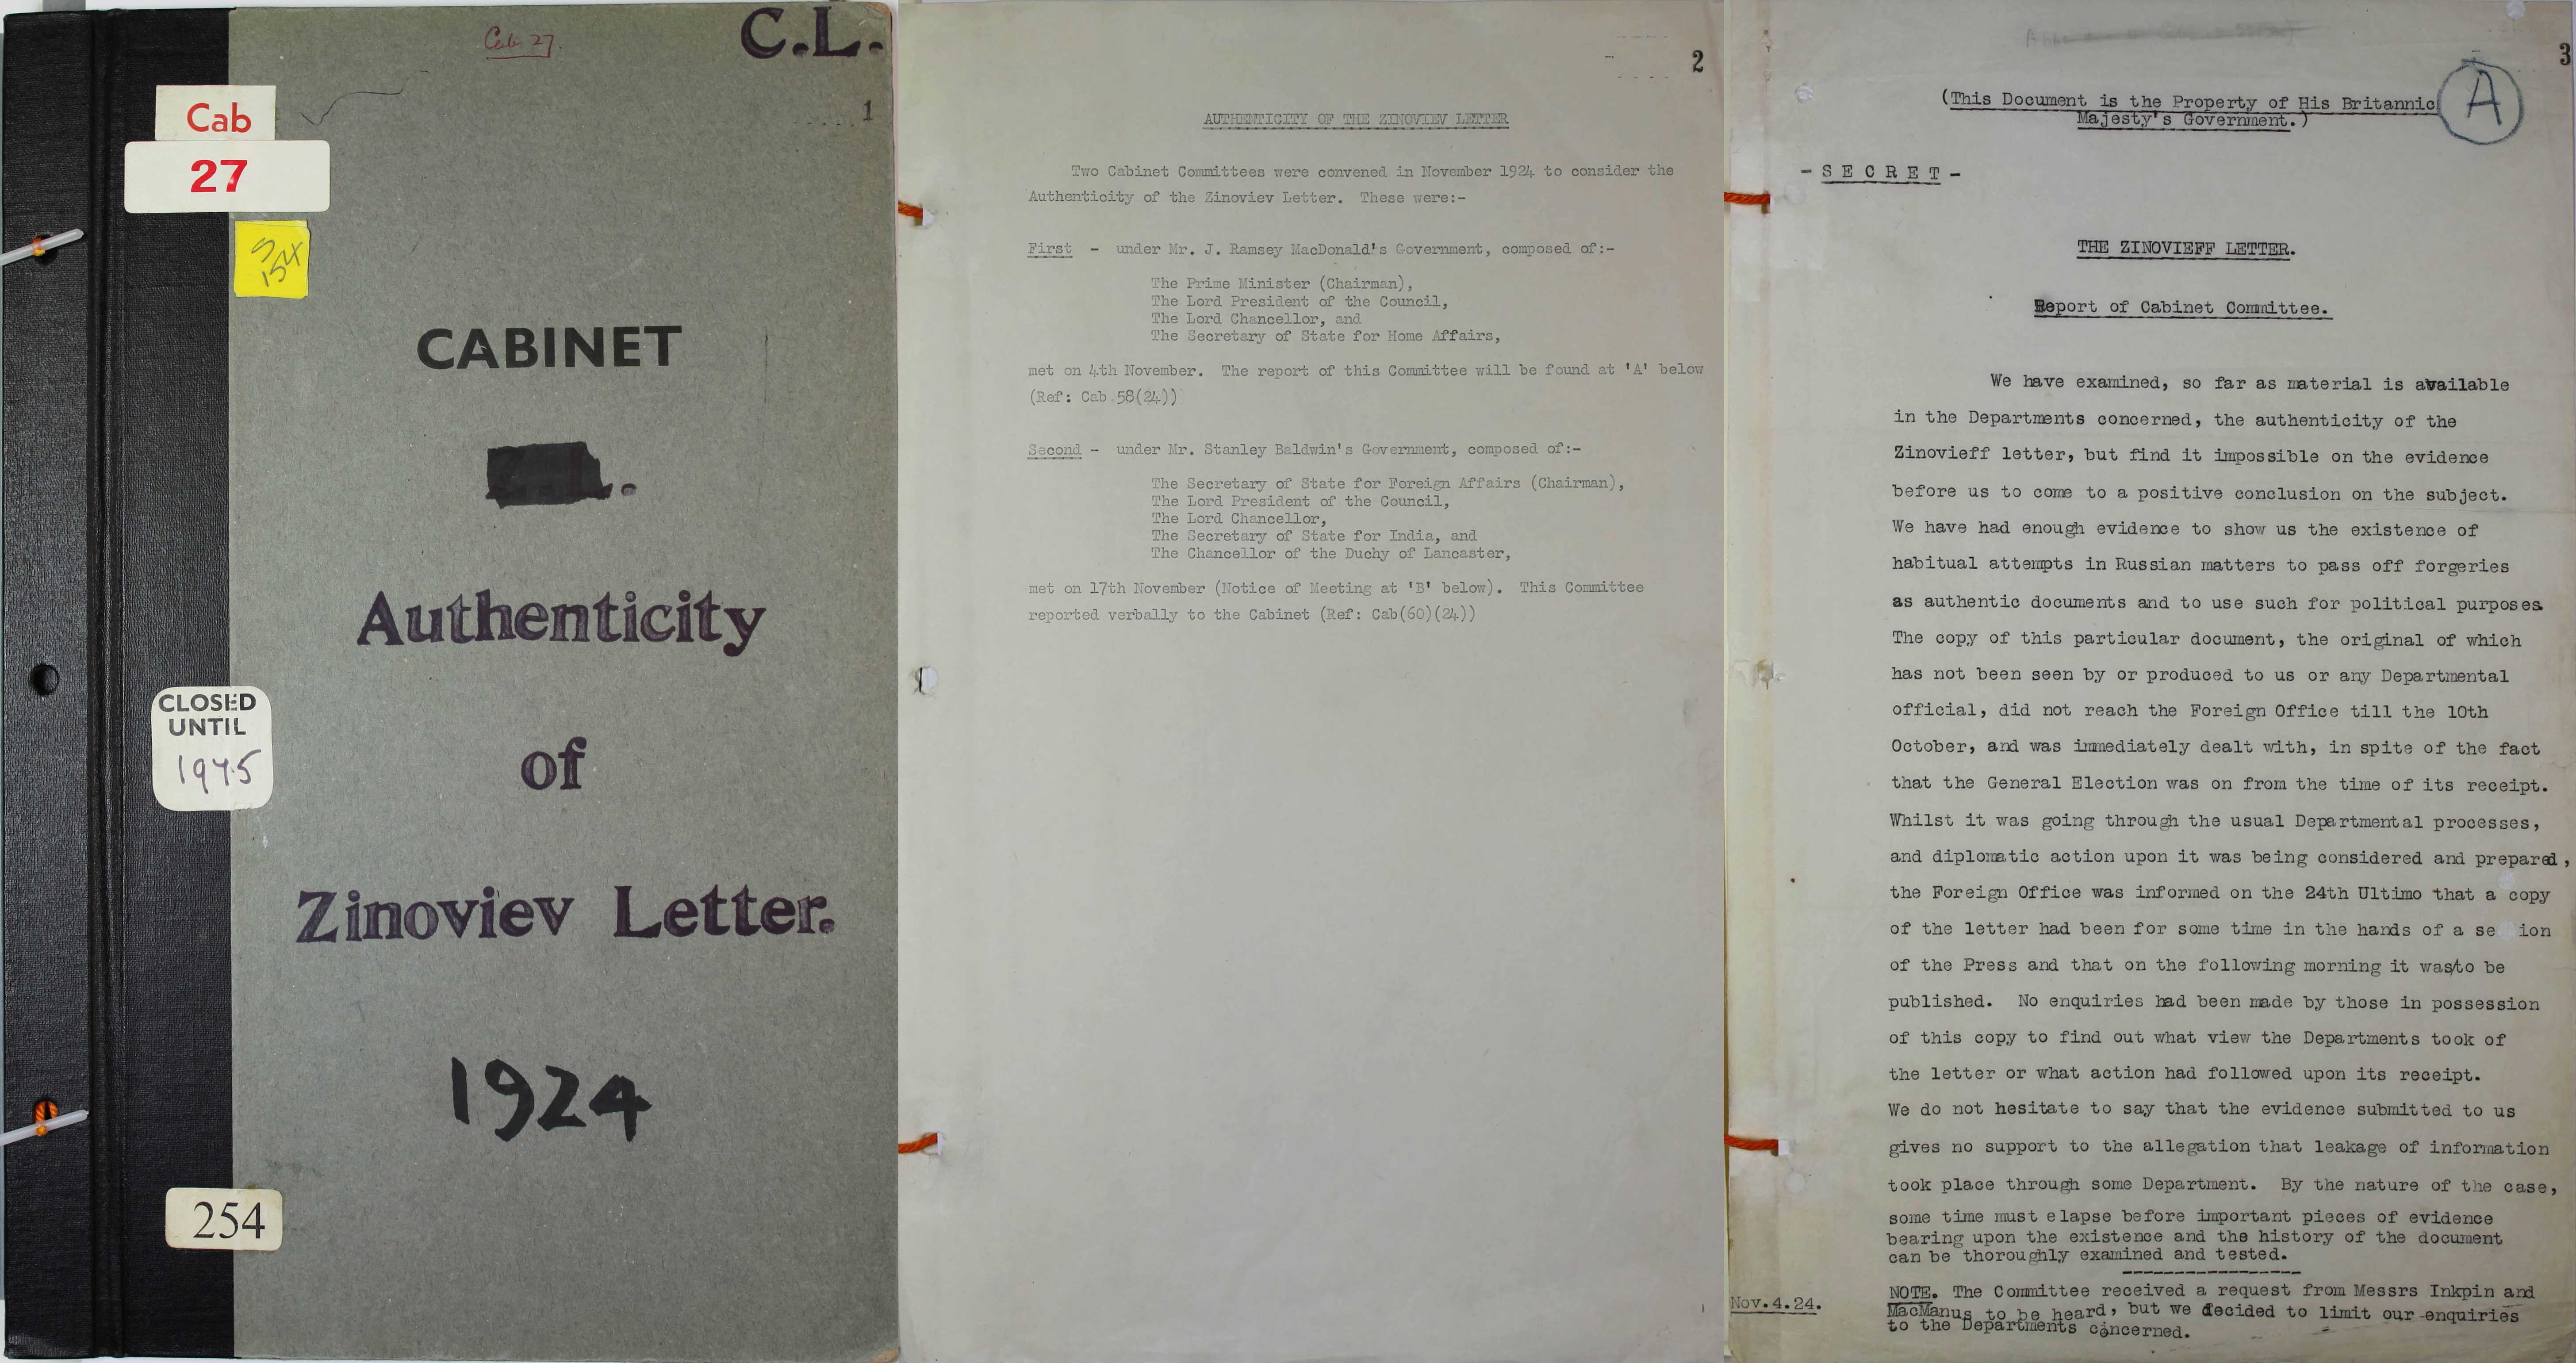 Zinoviev Letter CAB27/254